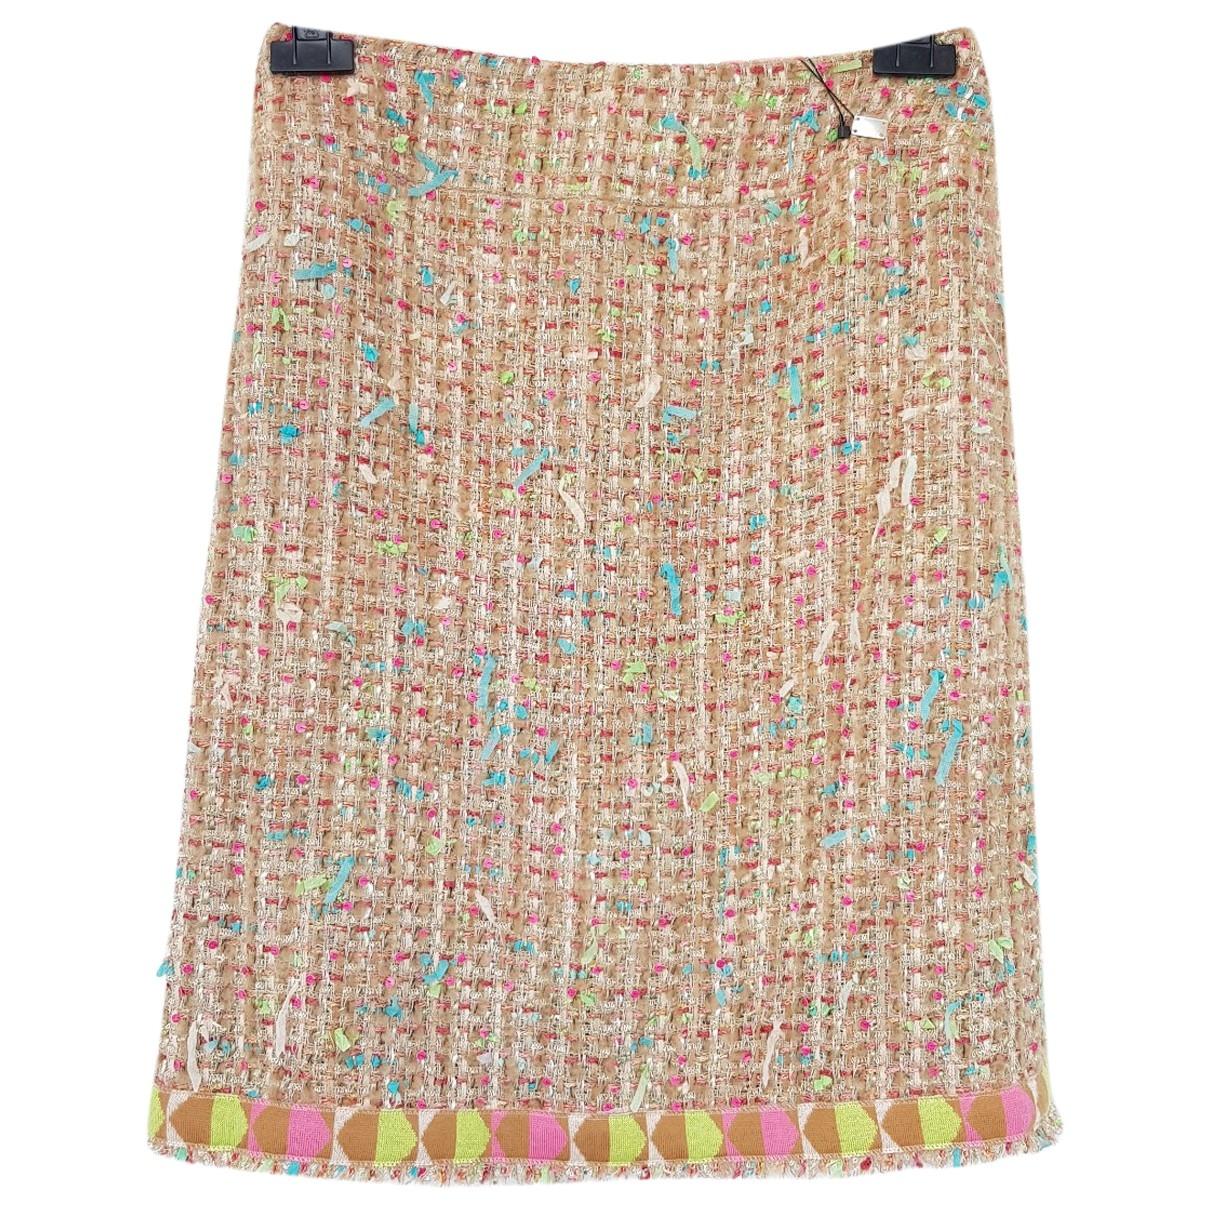 Chanel \N Beige Tweed skirt for Women 42 FR